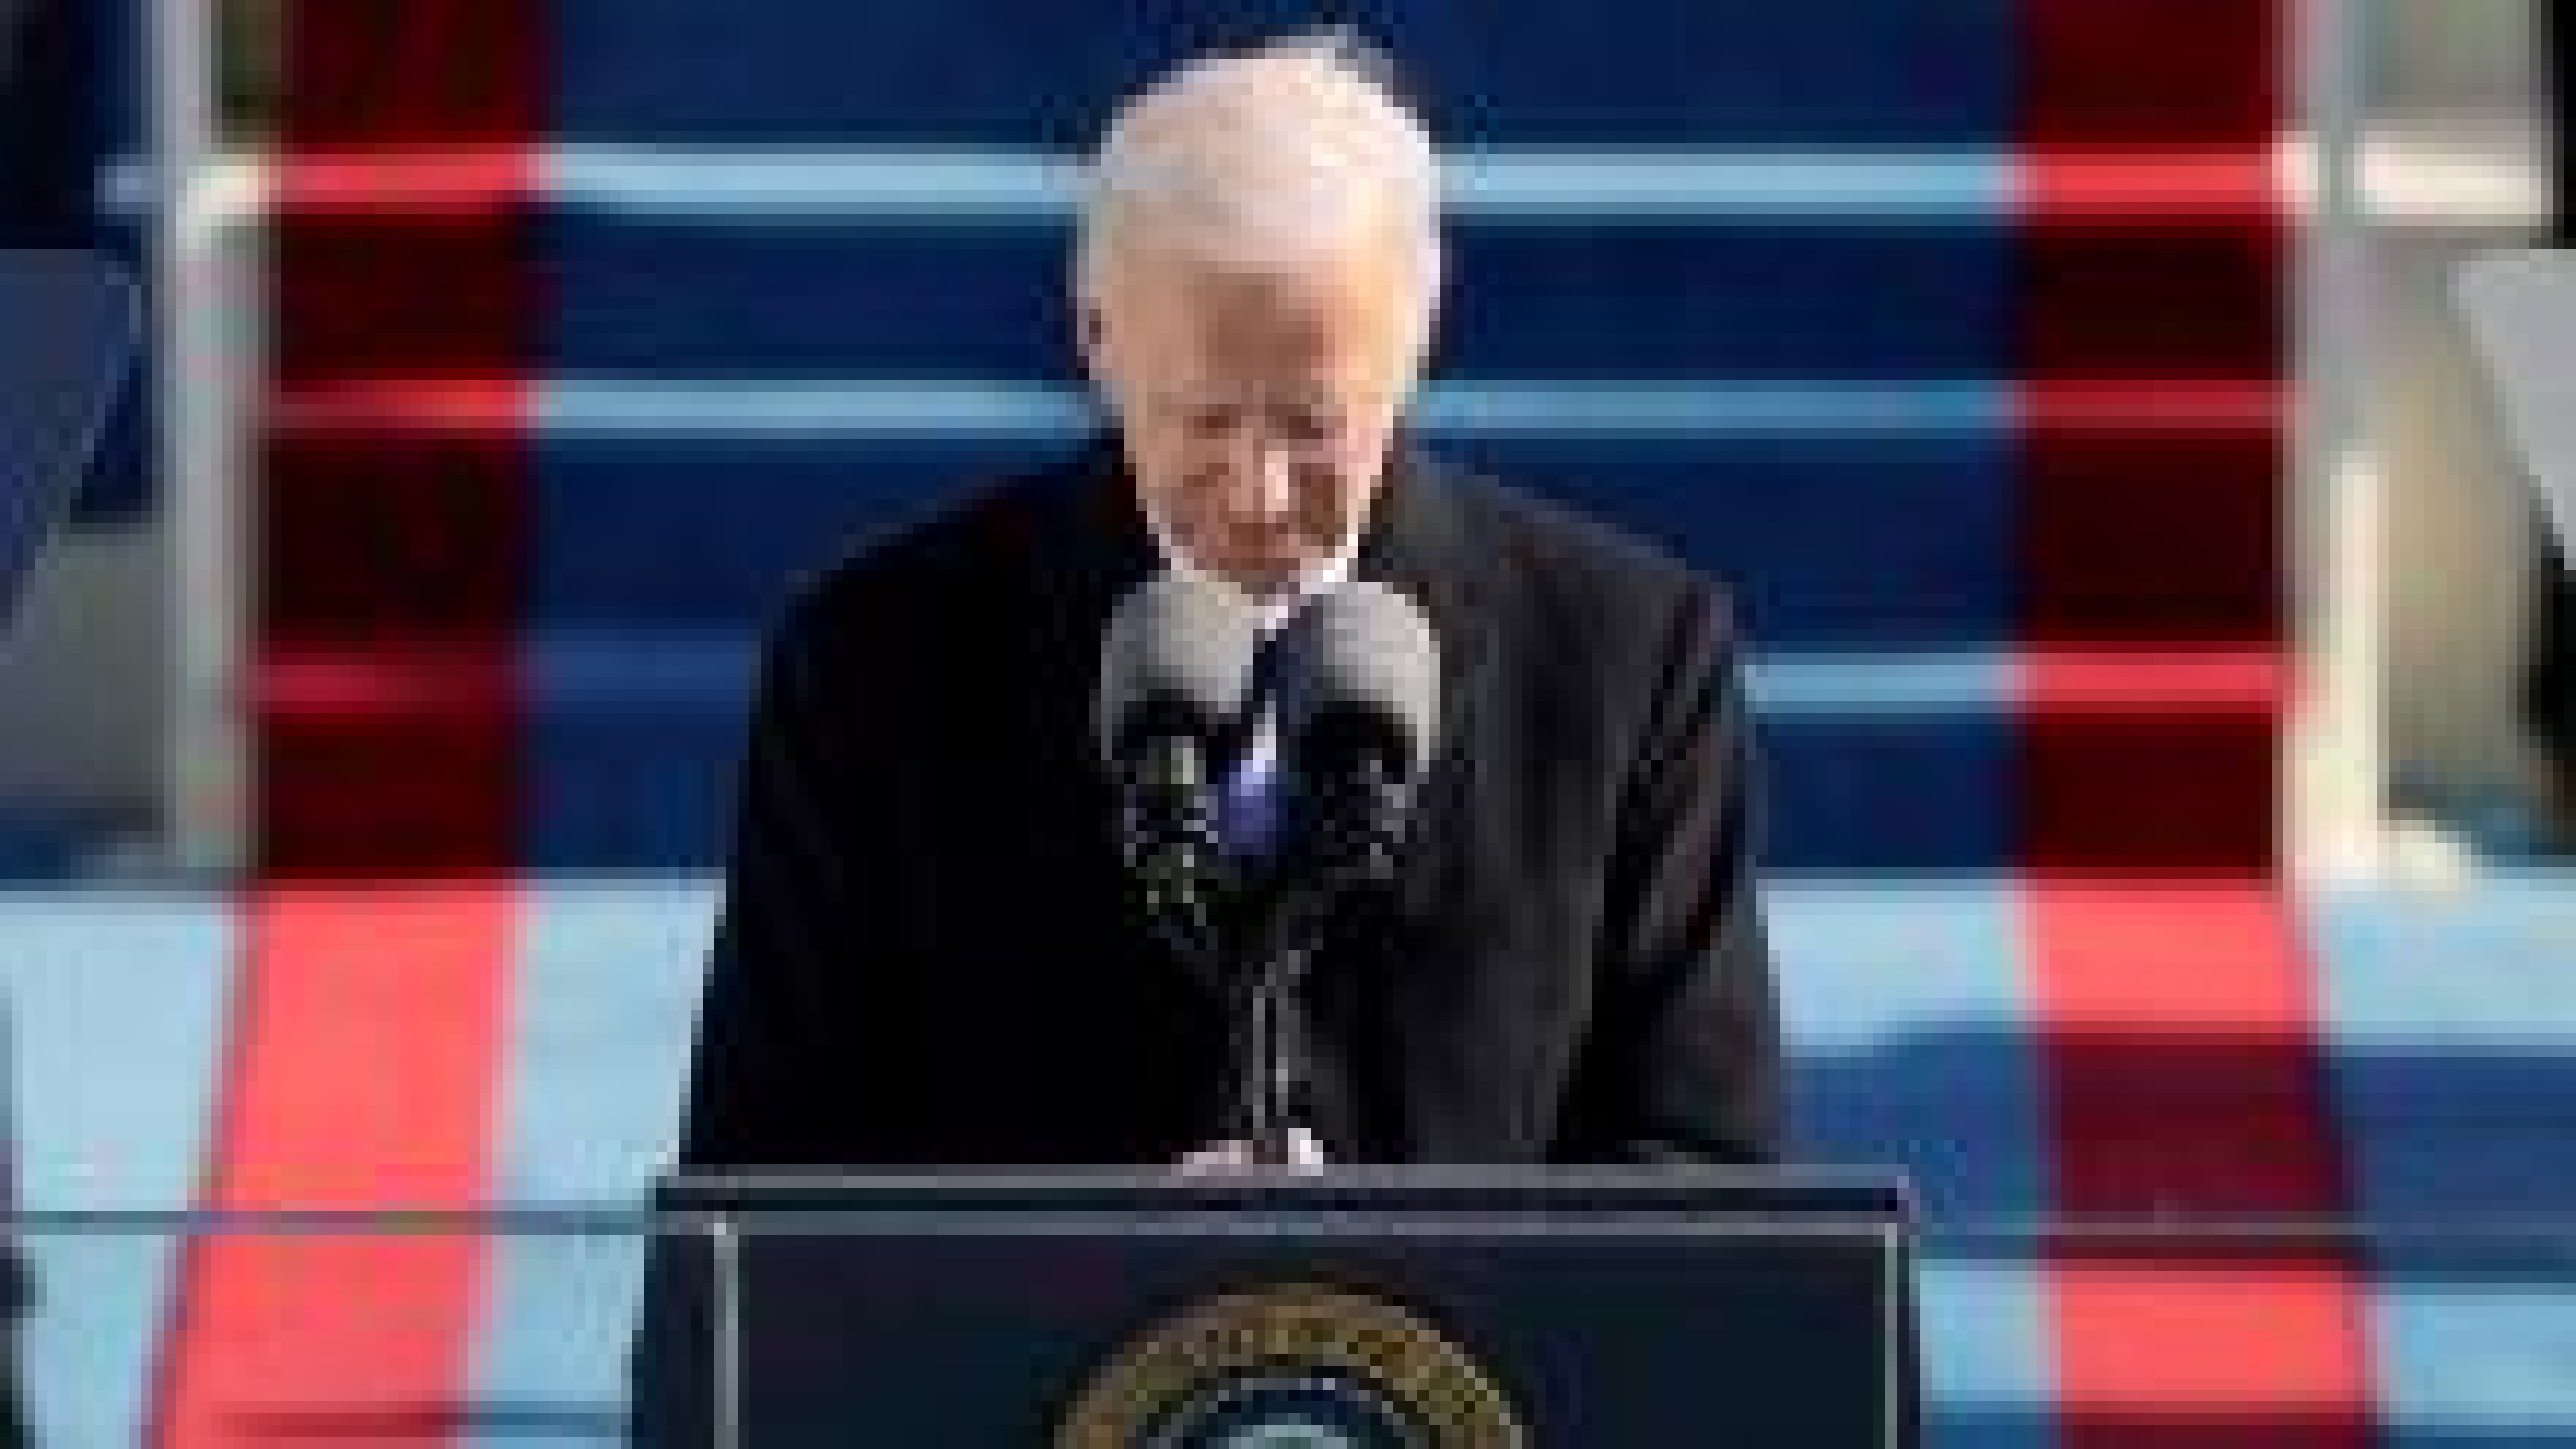 Joe Biden gives his inauguration day speech